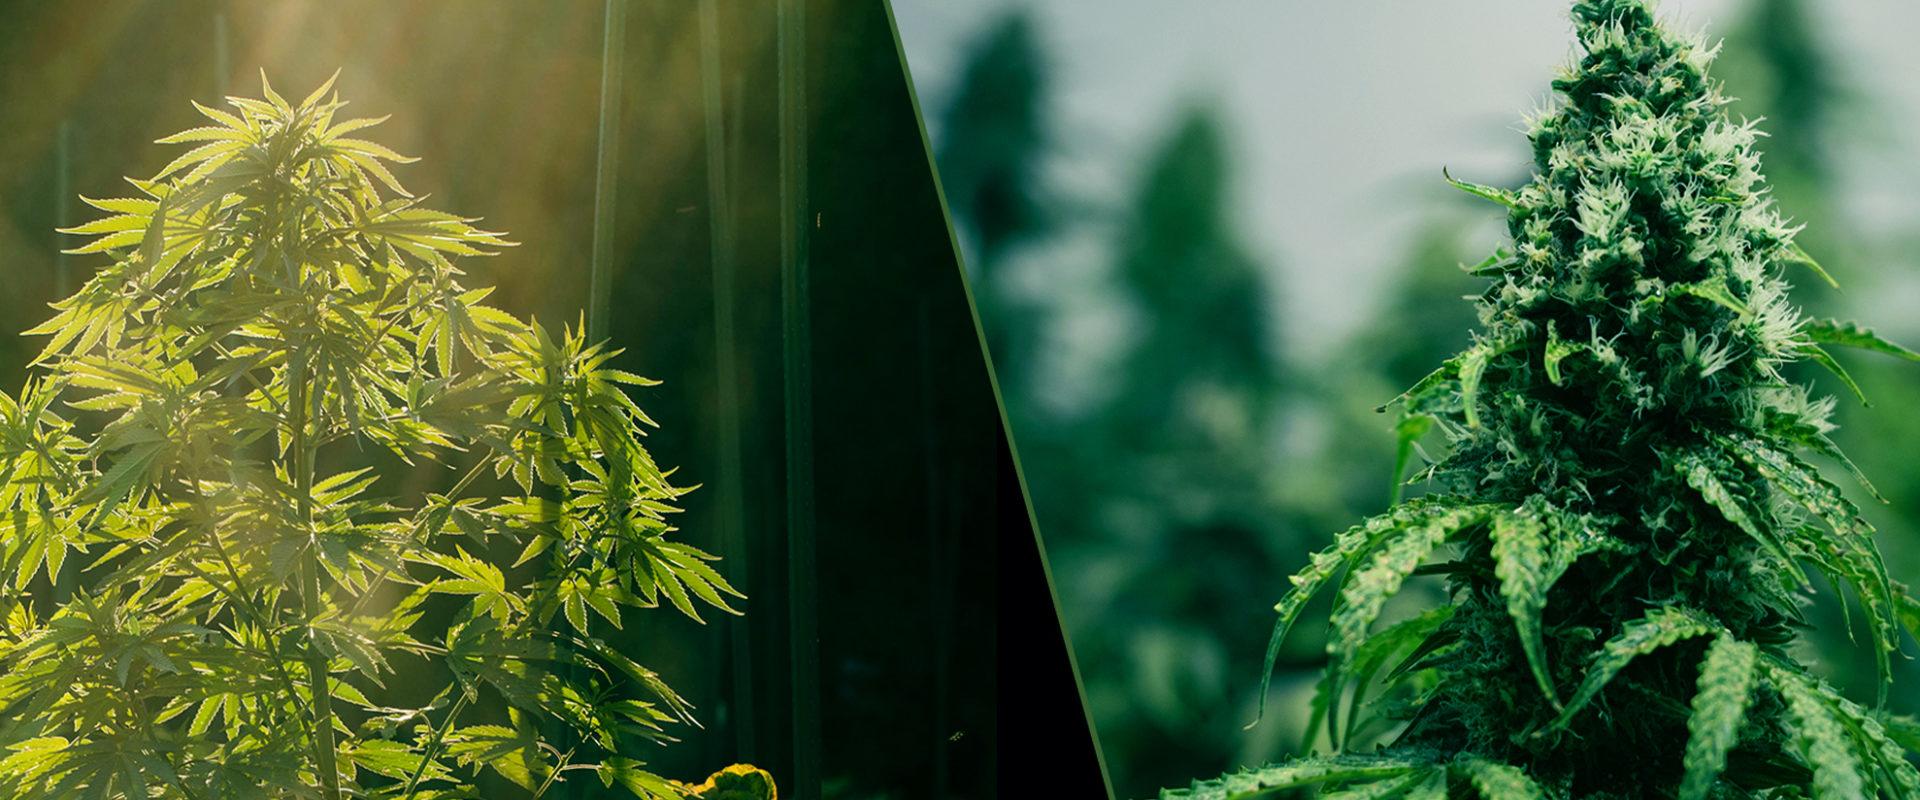 indoor and outdoor cannabis plants